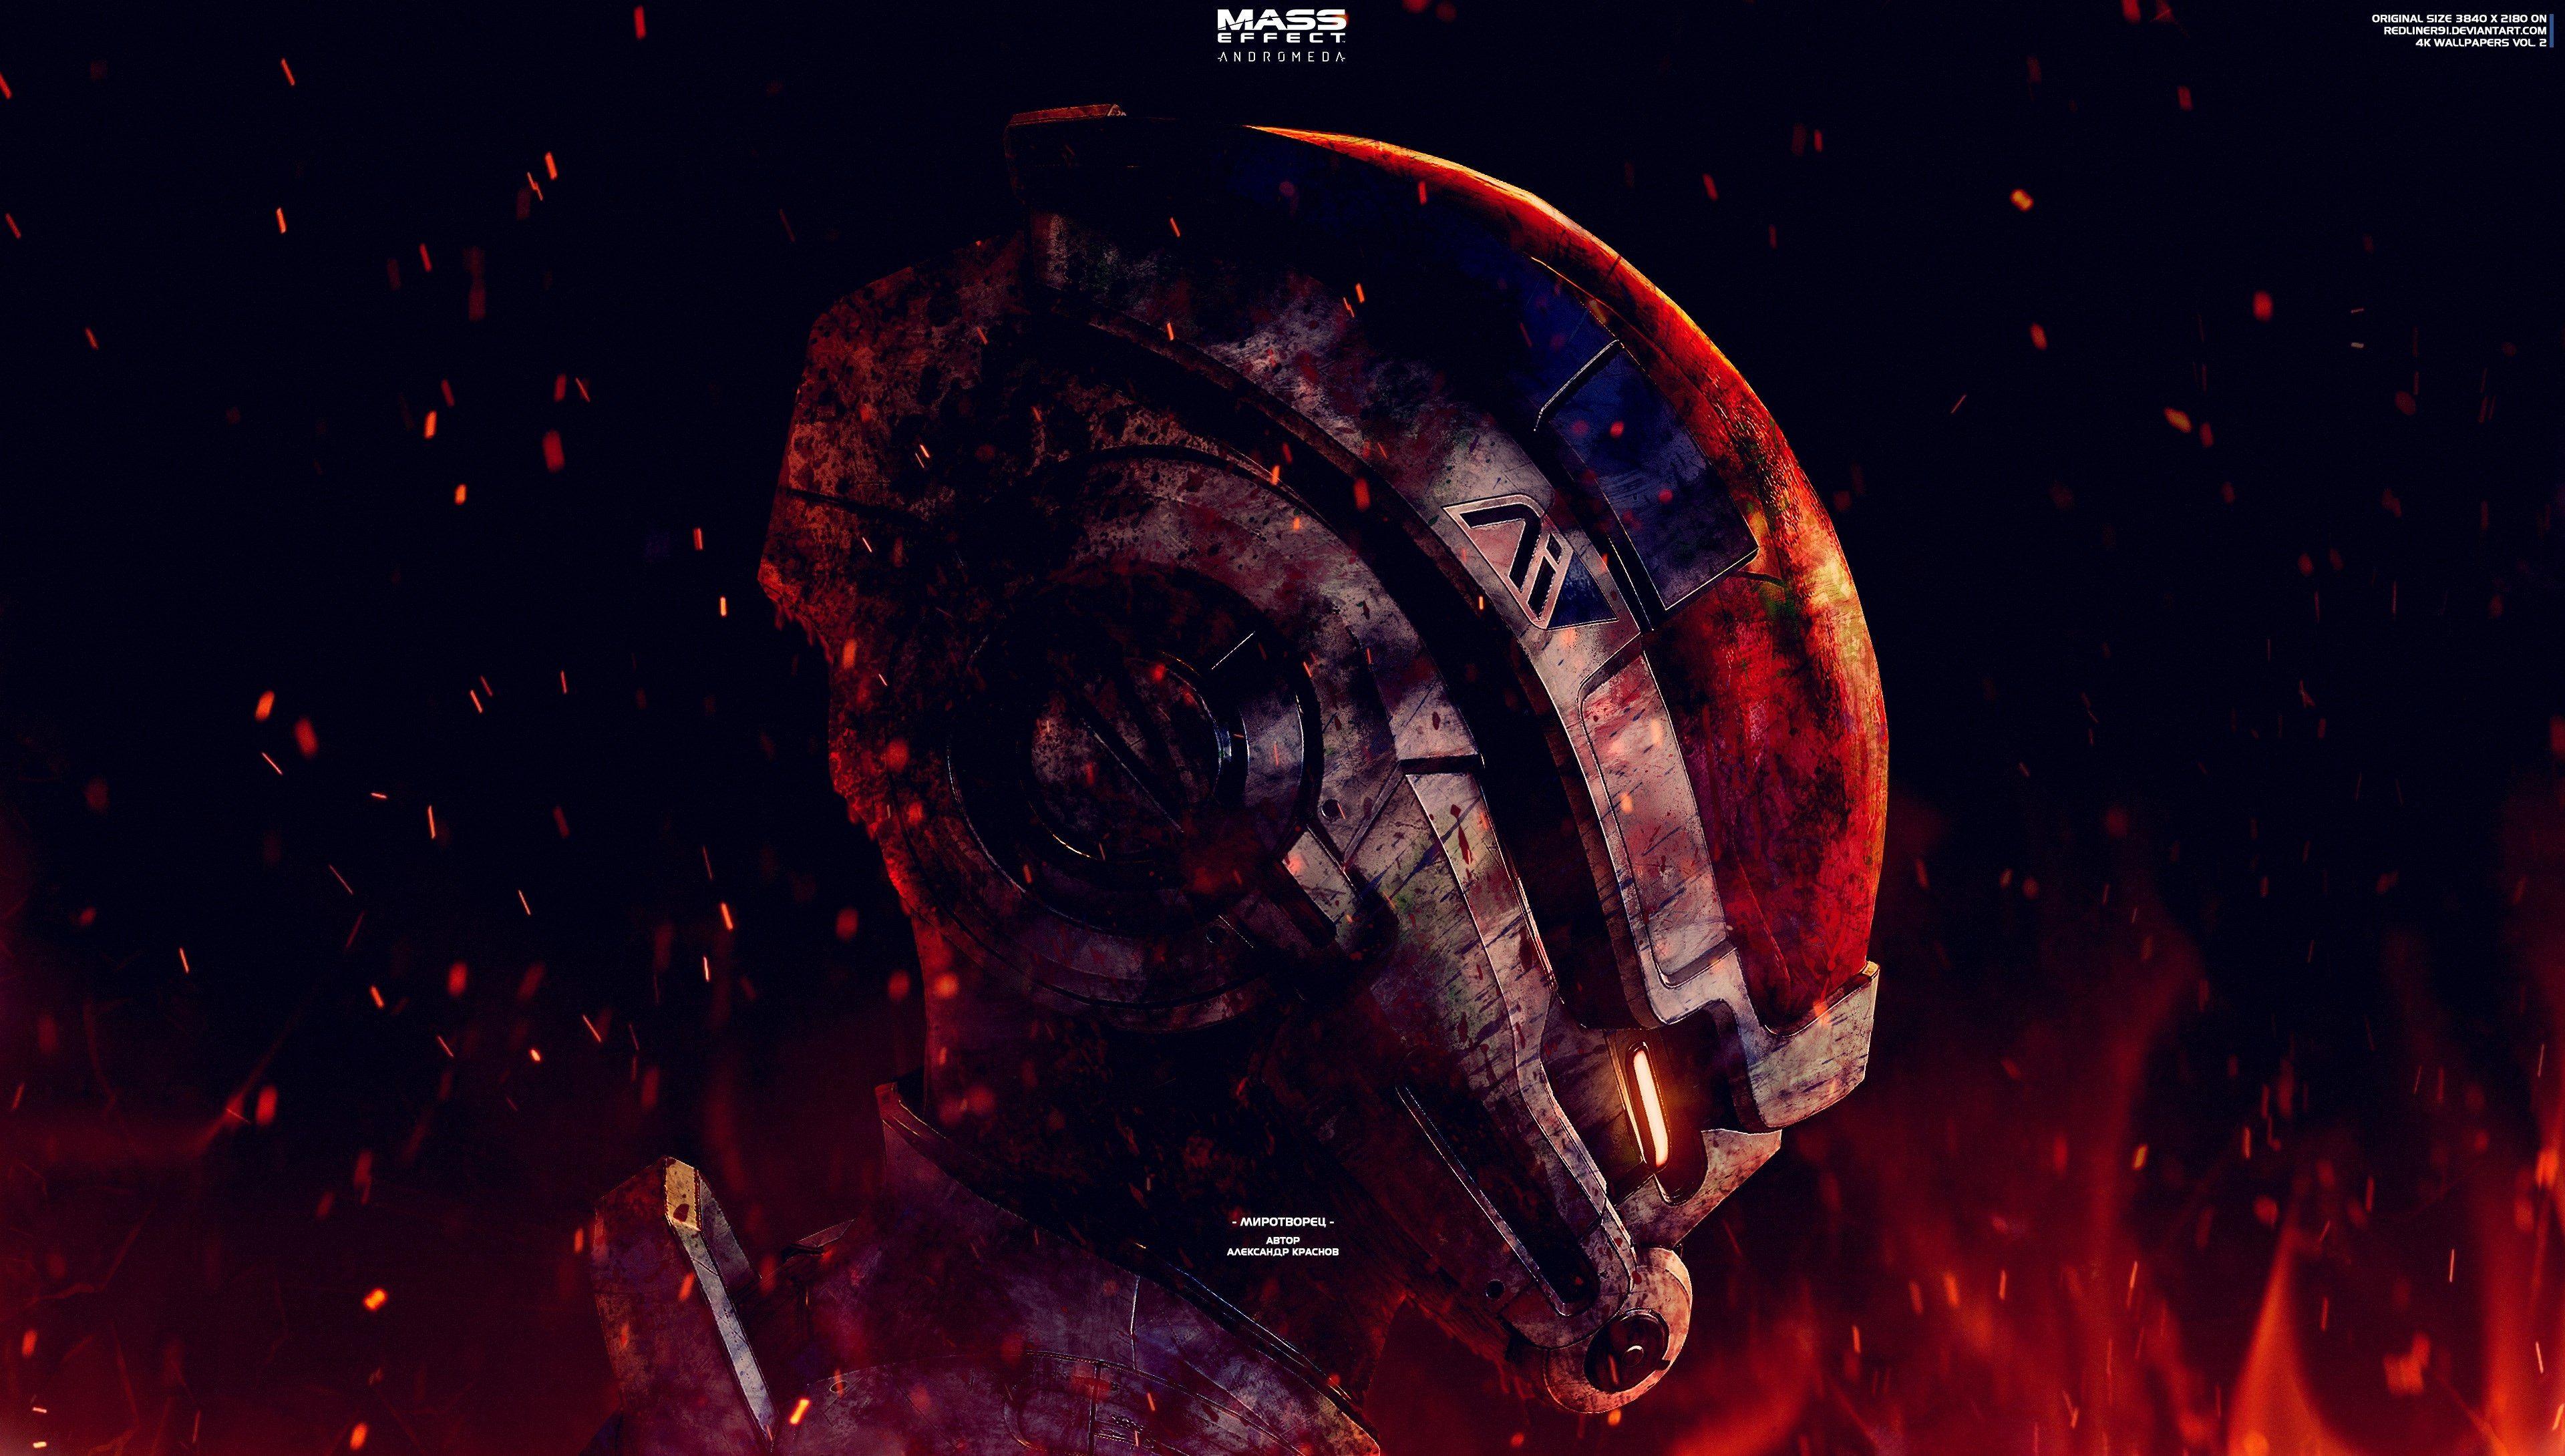 3840x2180 Mass Effect Andromeda 4k Free Amazing Wallpaper Mass Effect Digital Artwork Hd Wallpaper